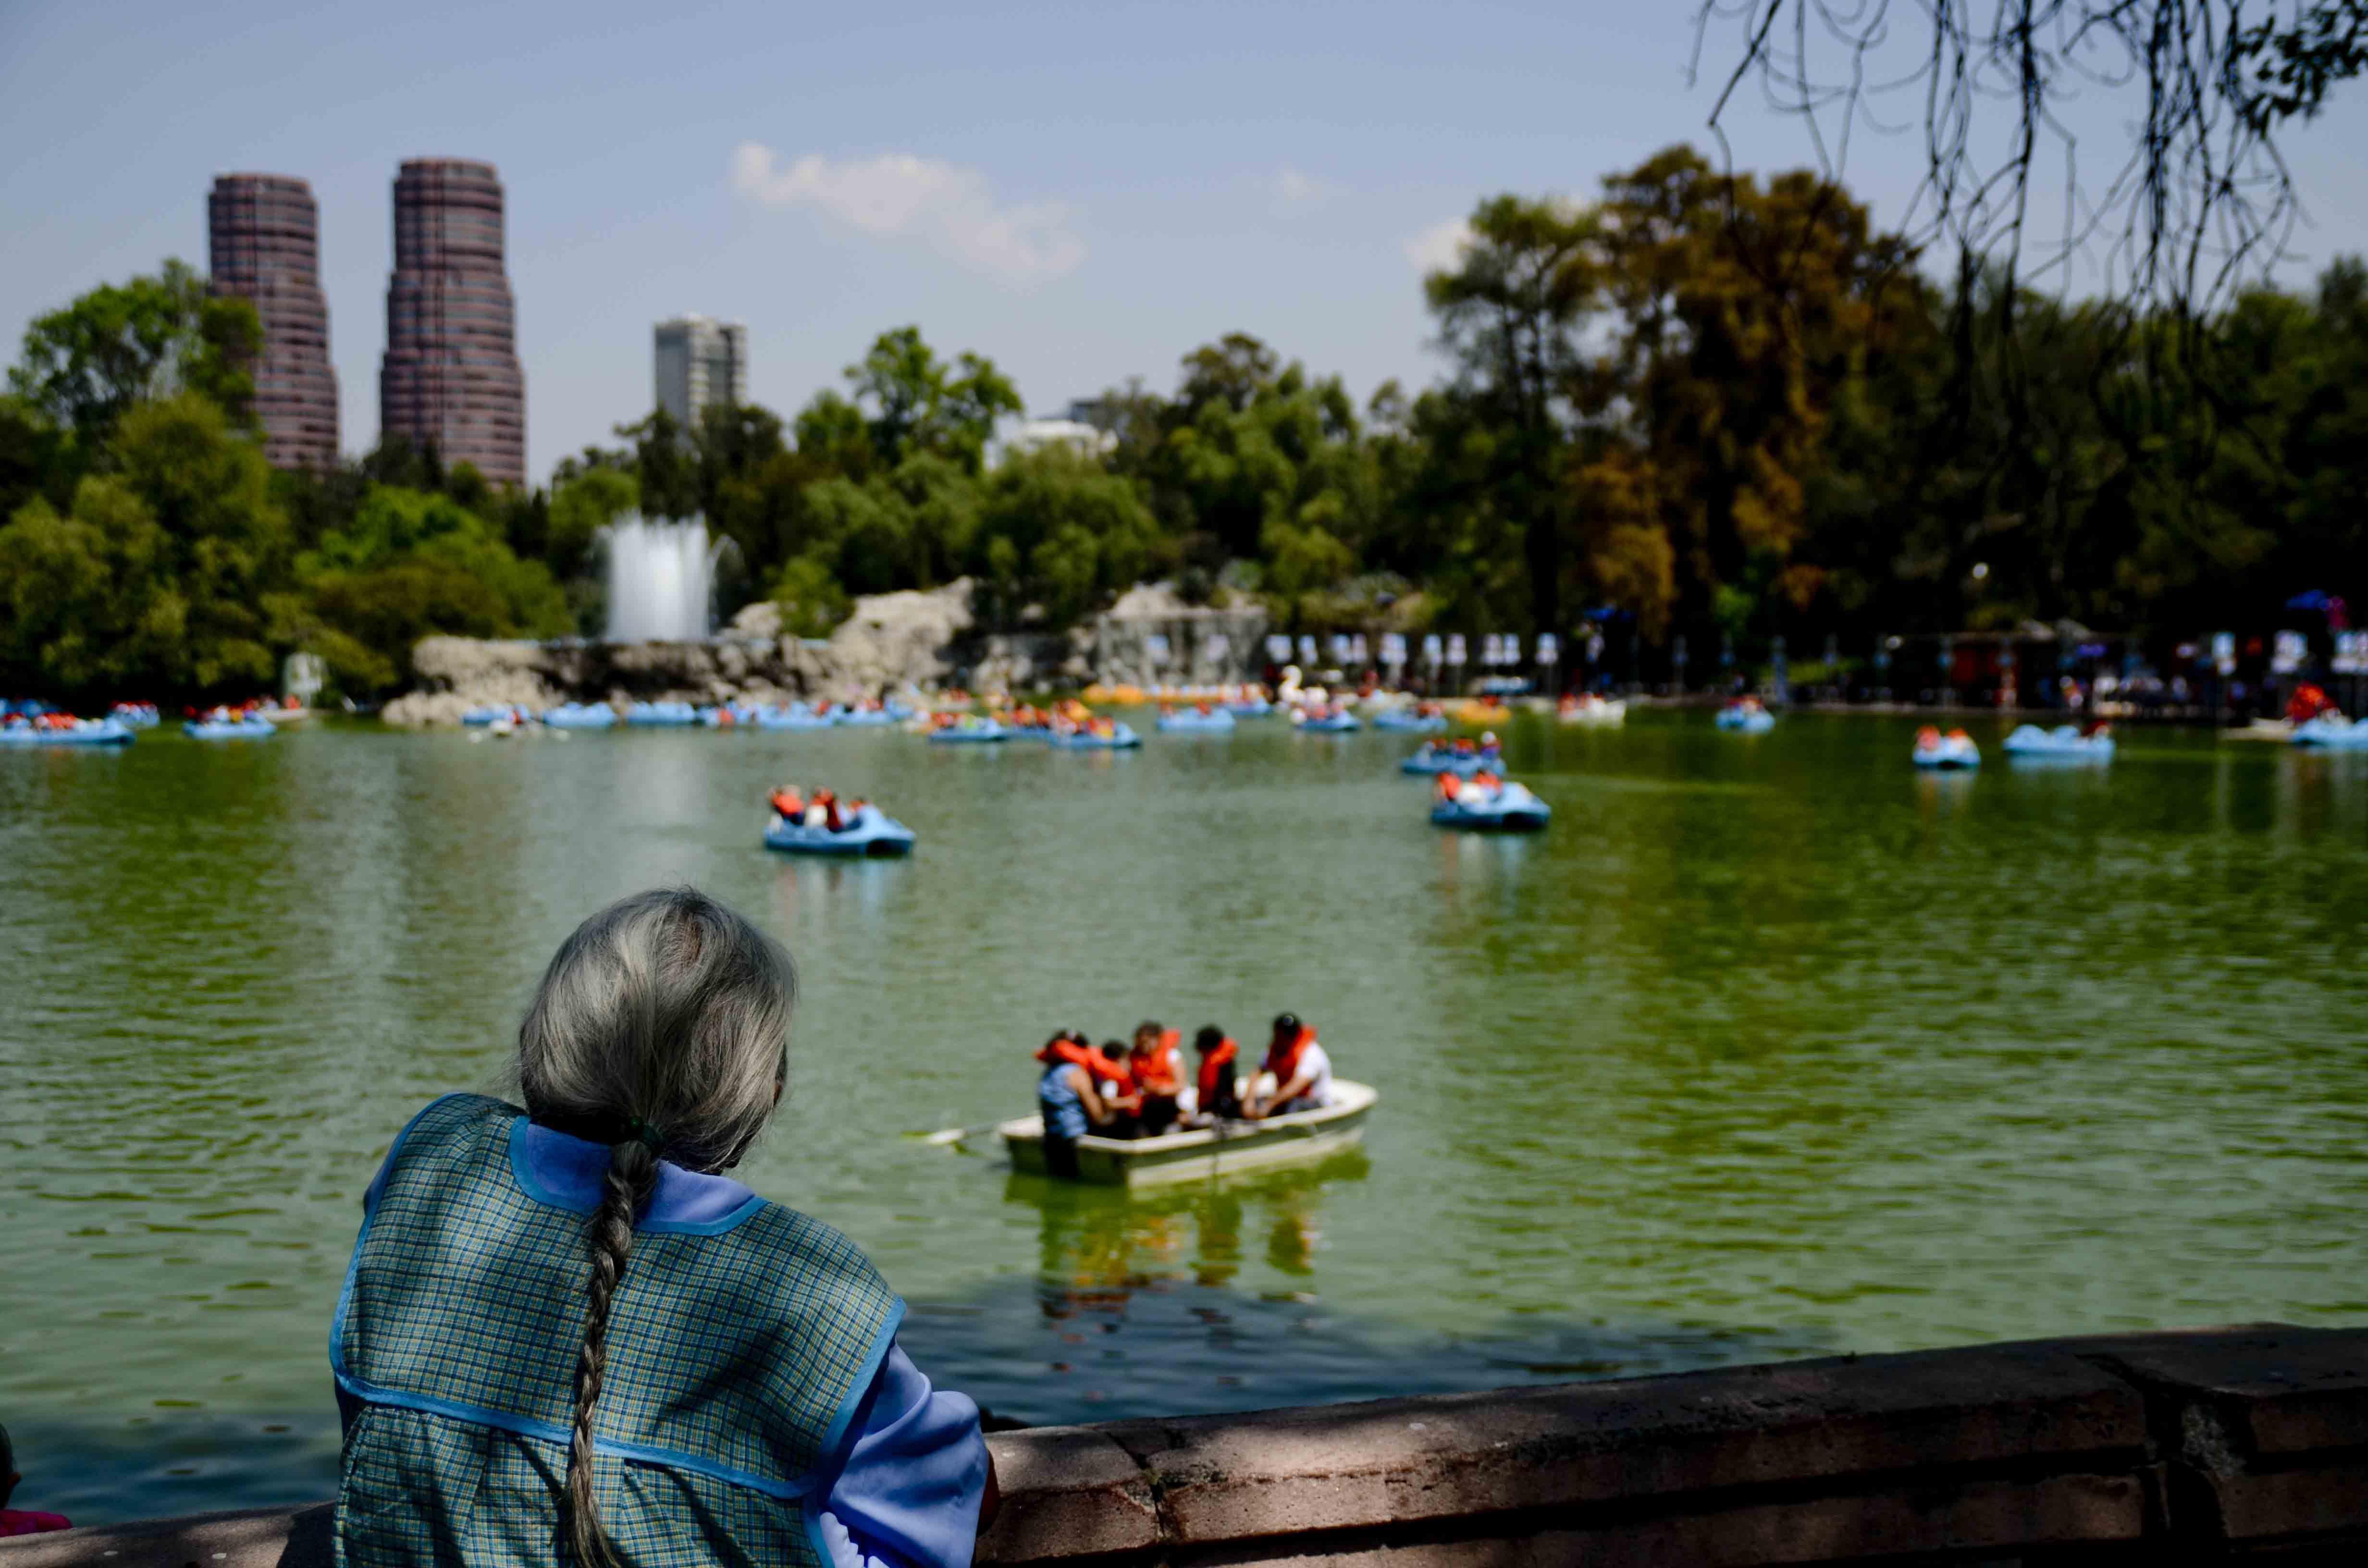 Parque Chapultepec, Mexico City, Mexico